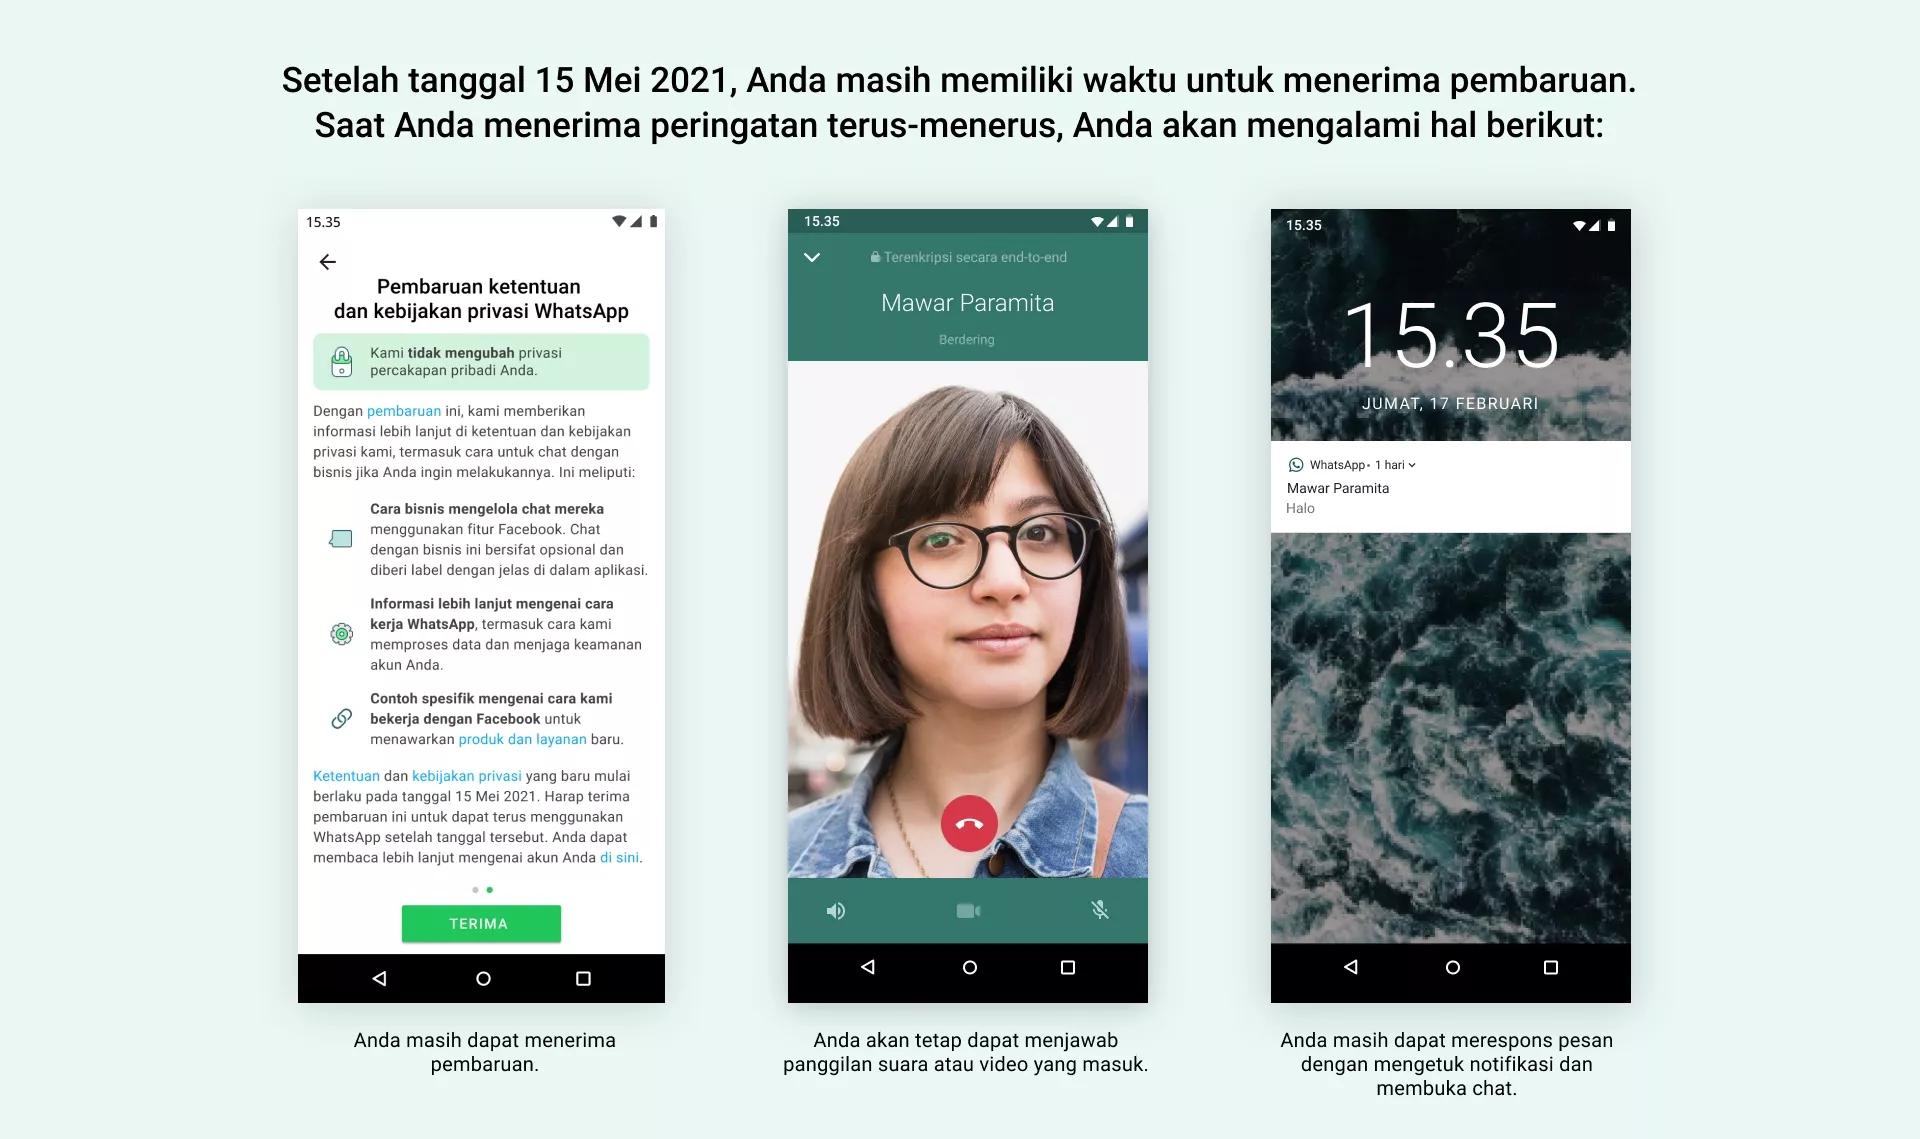 Kebijakan-Baru-WhatsApp-Mulai-Berlaku-15-Mei-2021